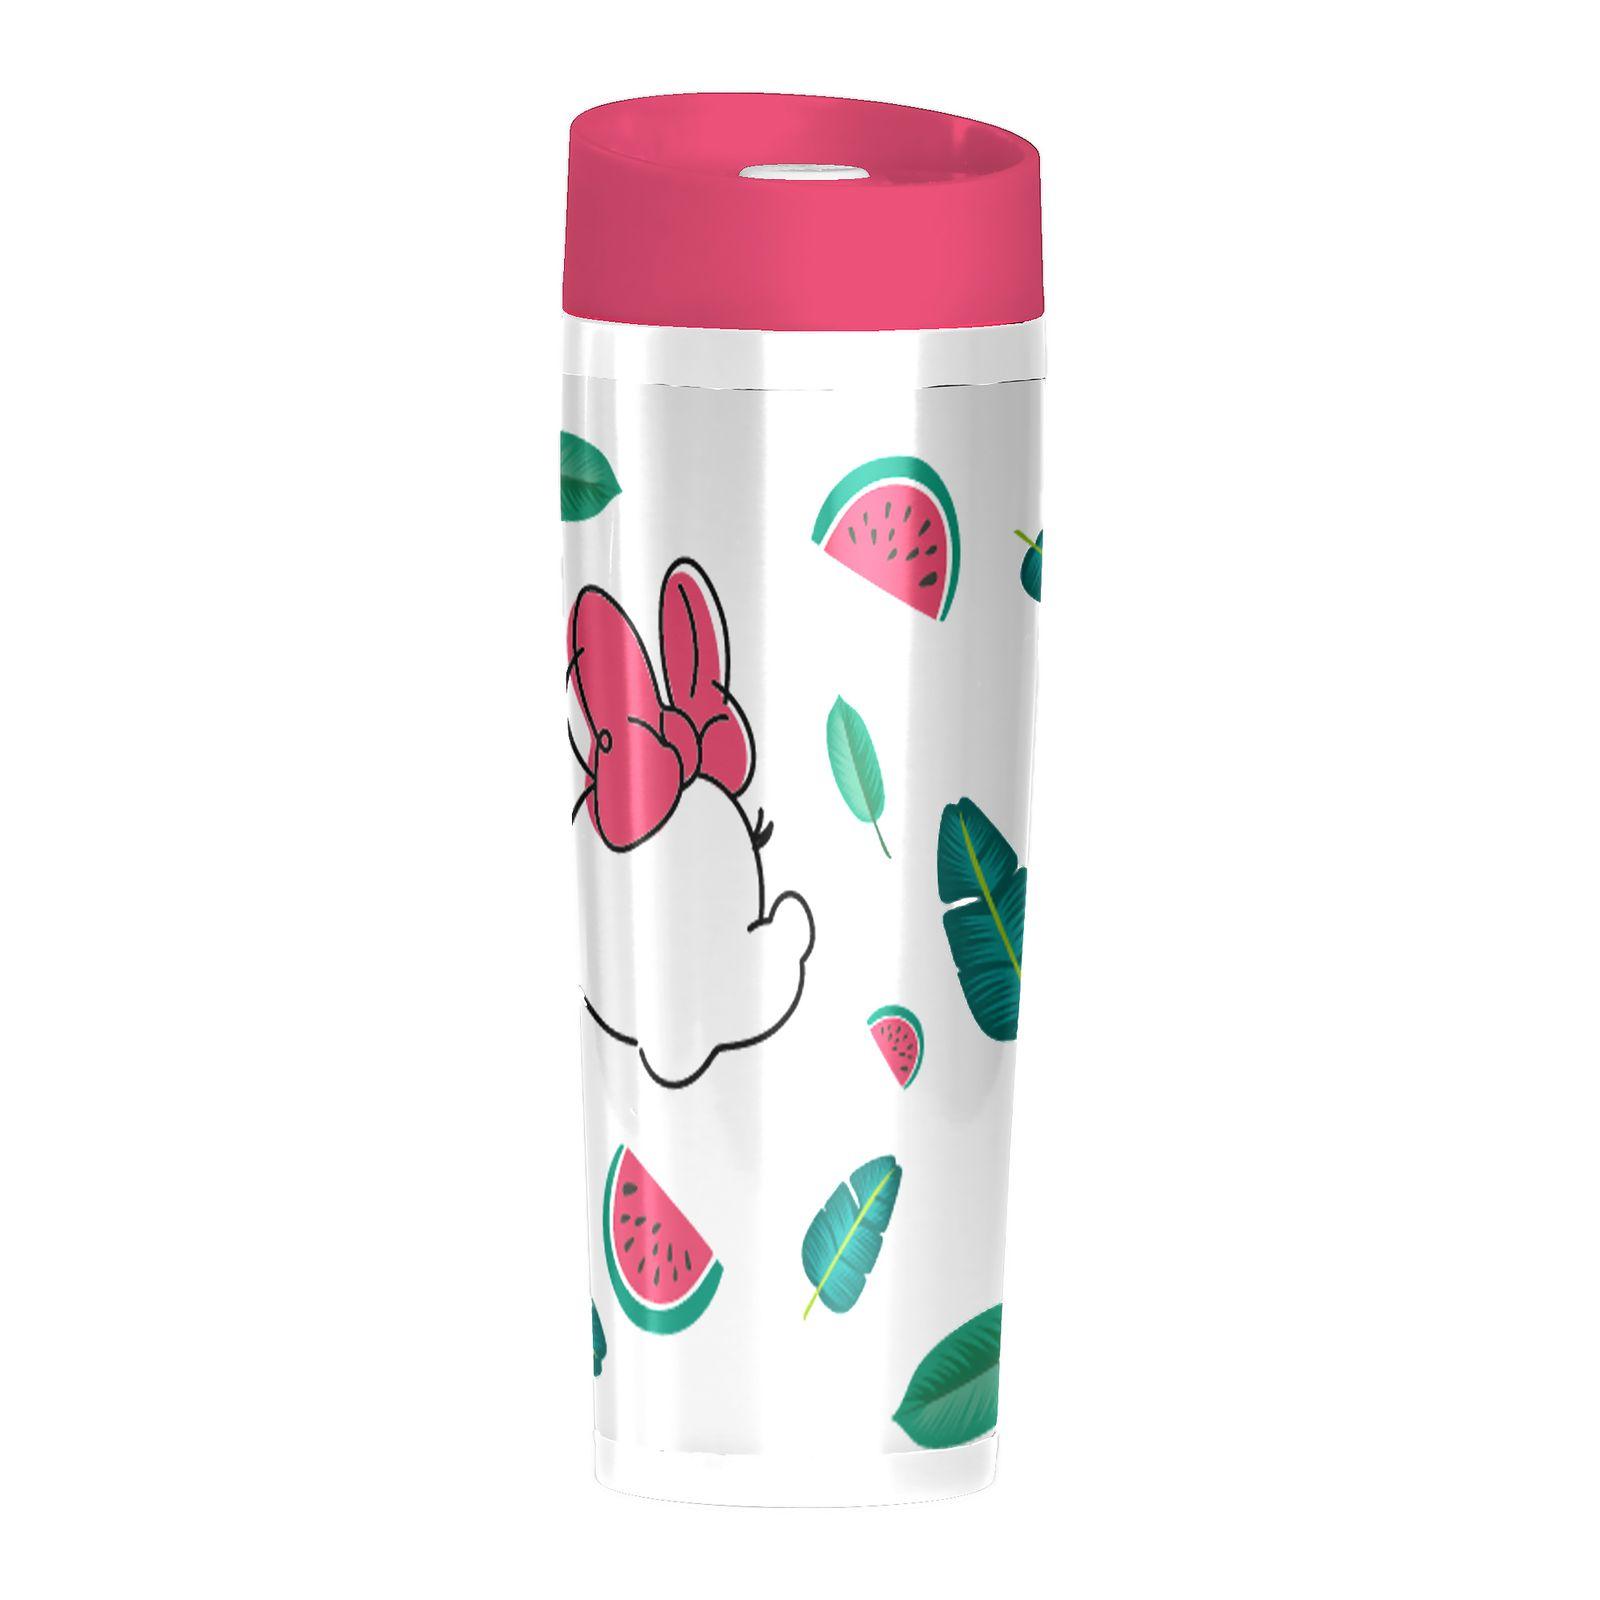 Thermal mug Minnie Watermelon 400 ml DISNEY / AMBITION